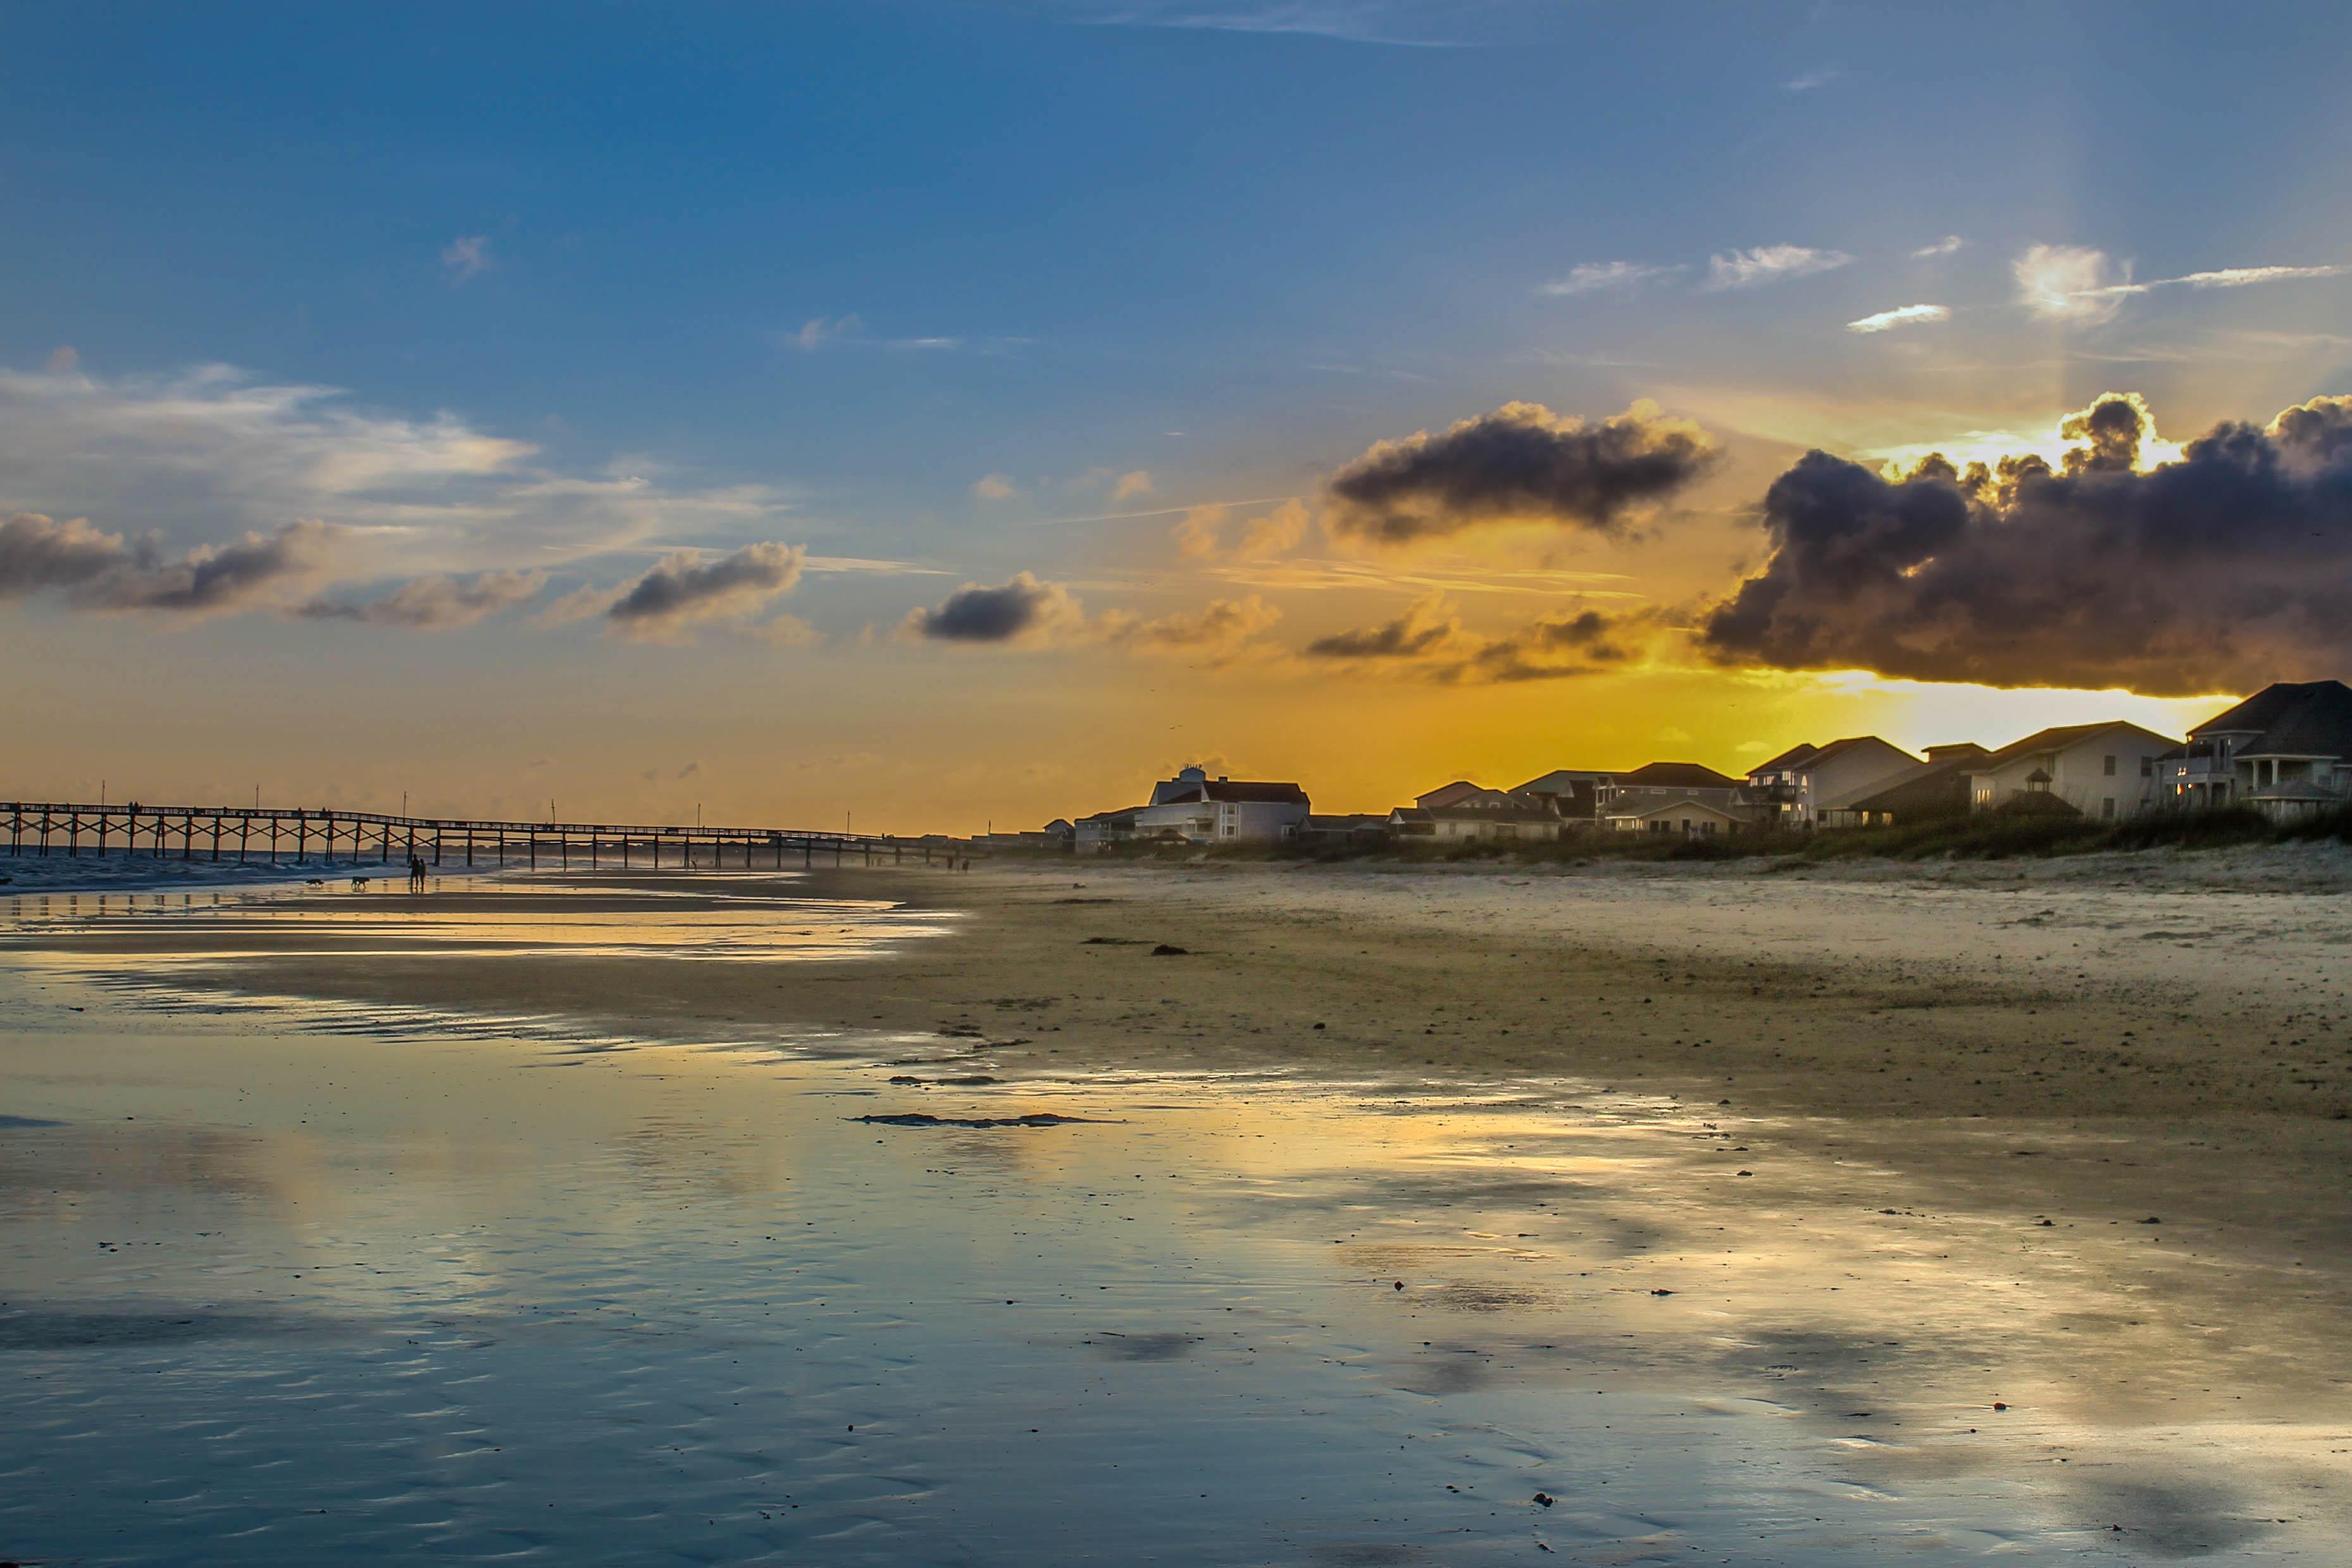 File:Oak Island NC Sunset.jpg - Wikimedia Commons